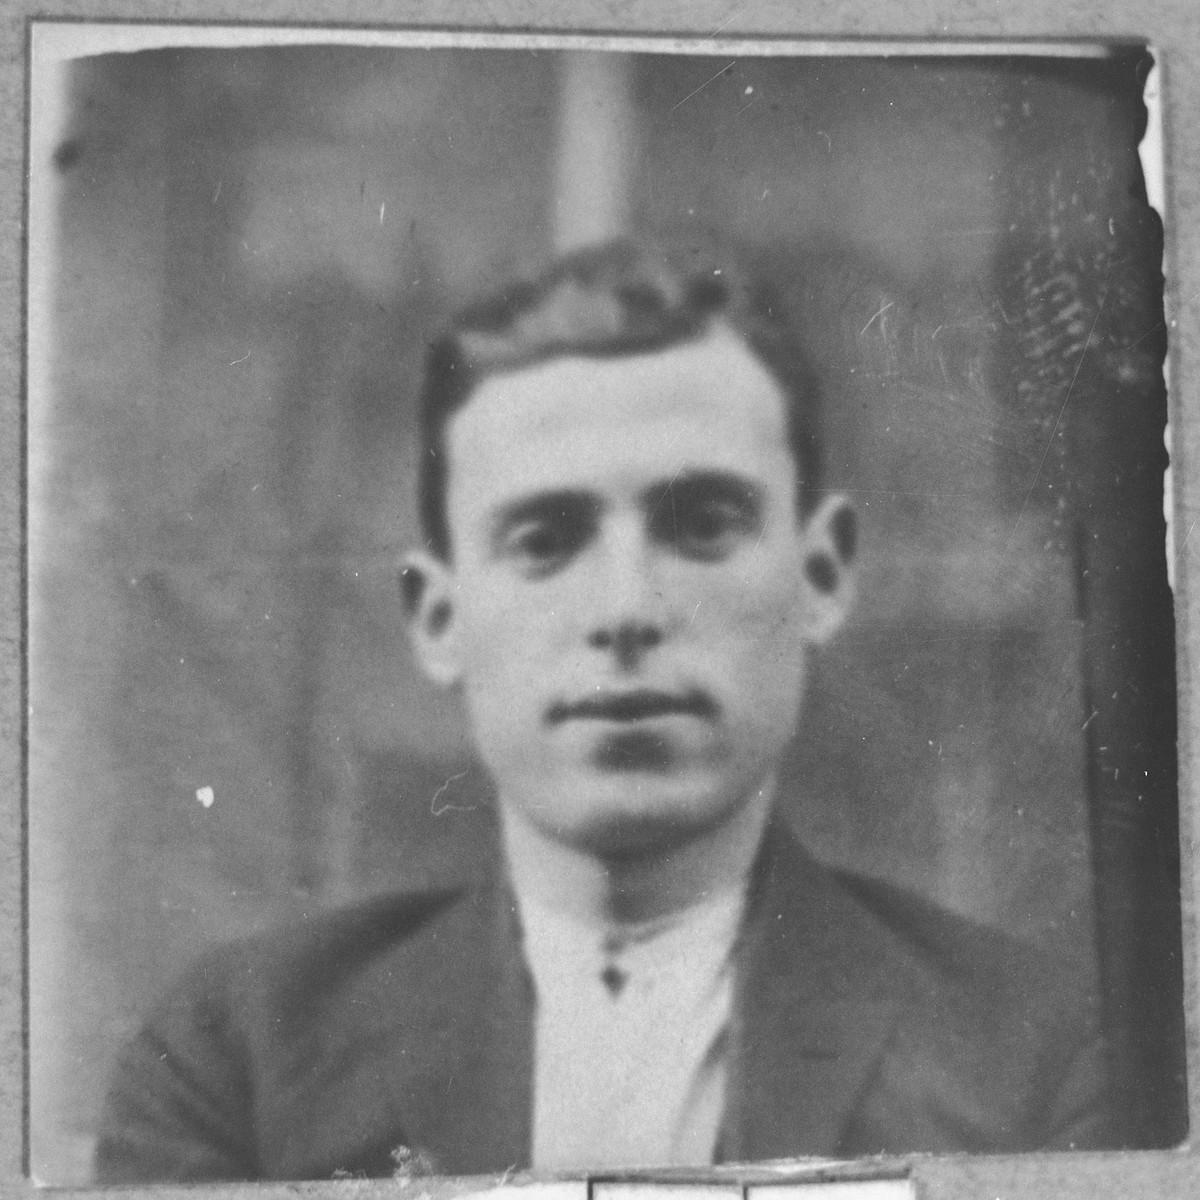 Portrait of Mois Talvi.  He was a second-hand dealer.  He lived at Asadbegova 24 in Bitola.